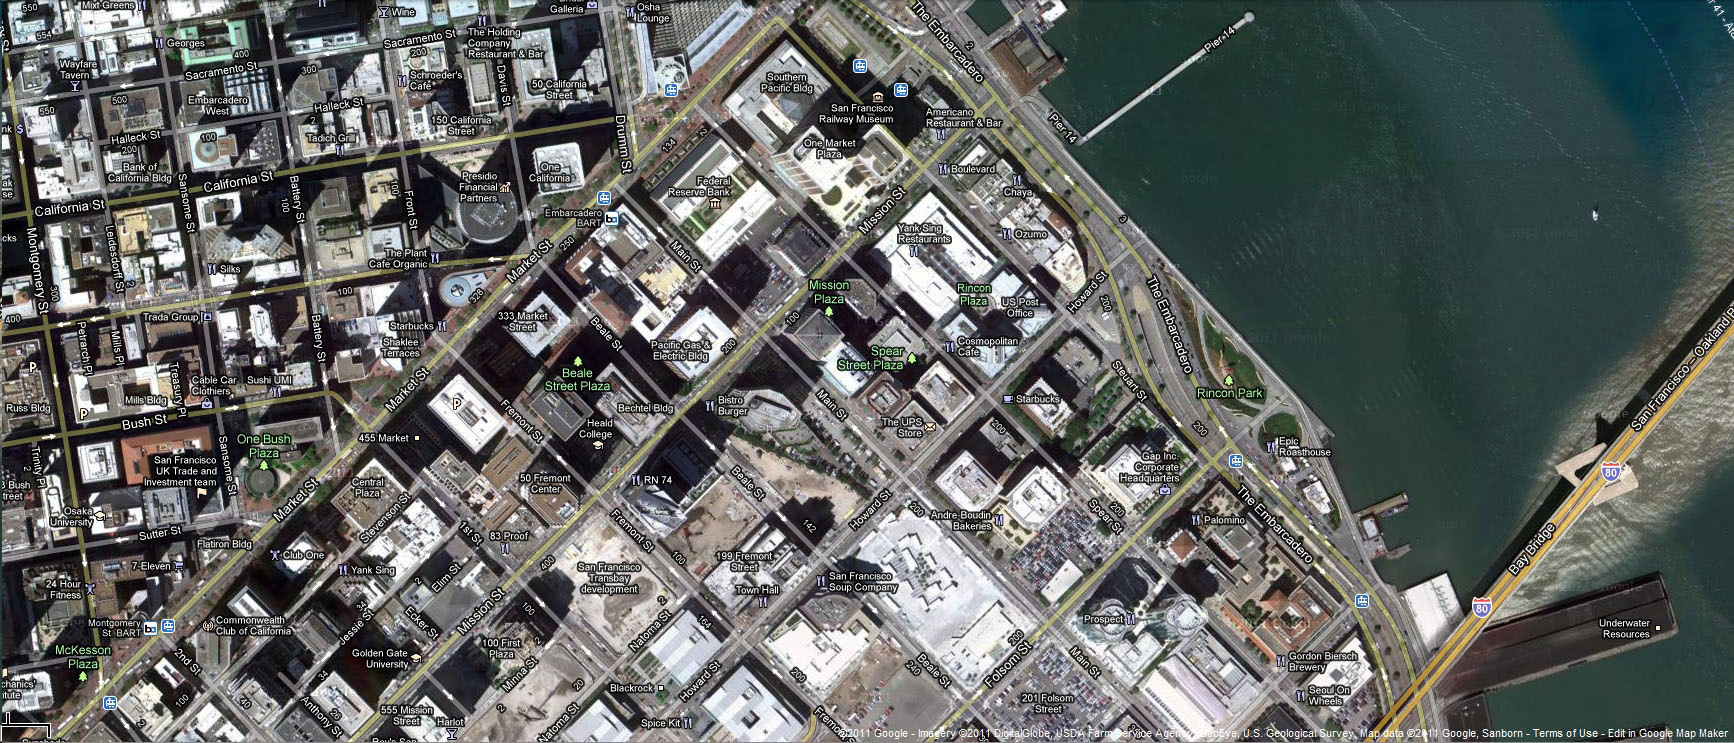 00 The Embarcadero San Francisco California satelite map 01